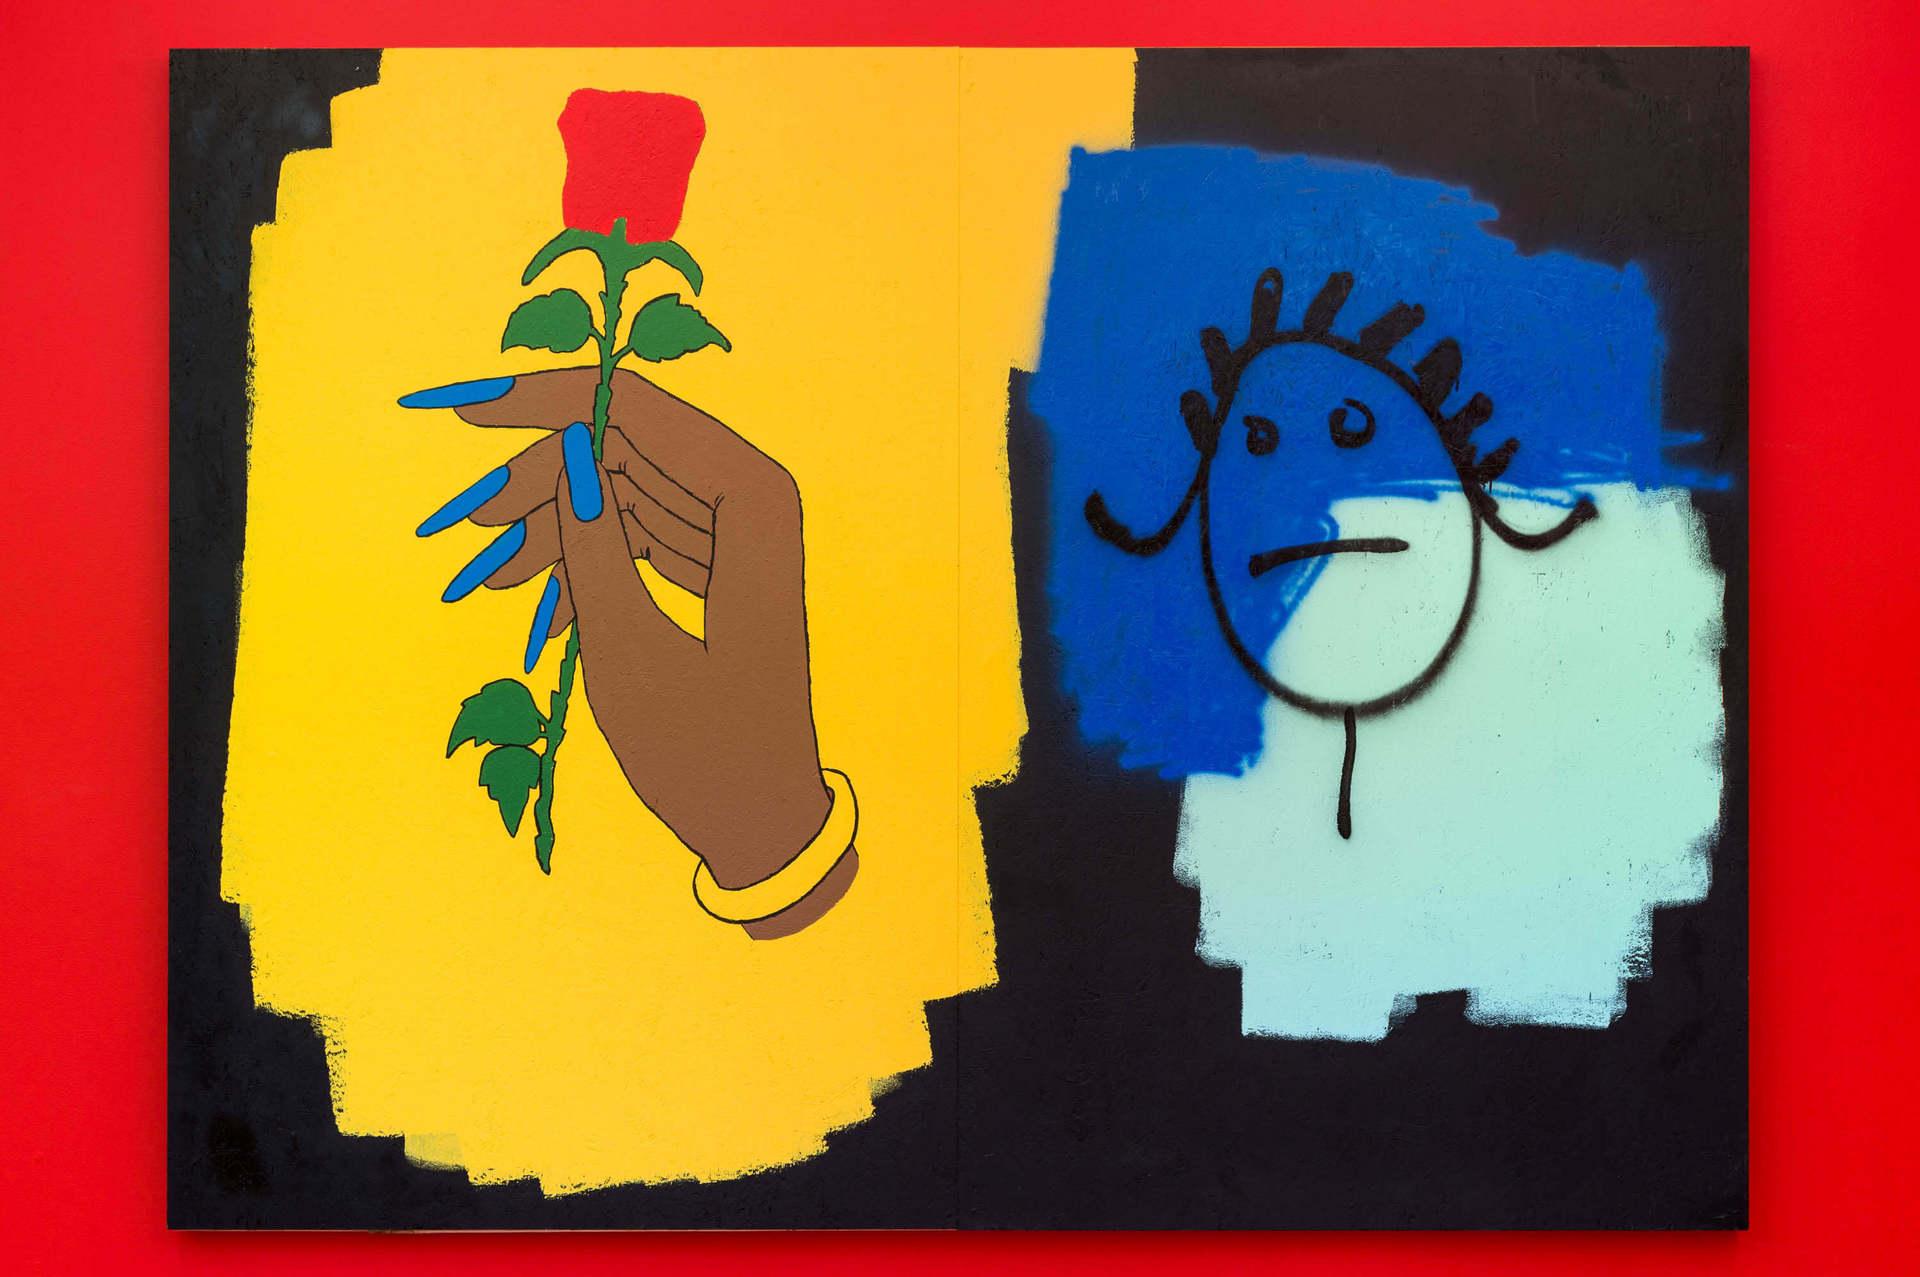 Same Ol' Mistakes, House and spray paint on OSB, 72 x 96 in. Courtesy Nina Johnson Gallery and artist.